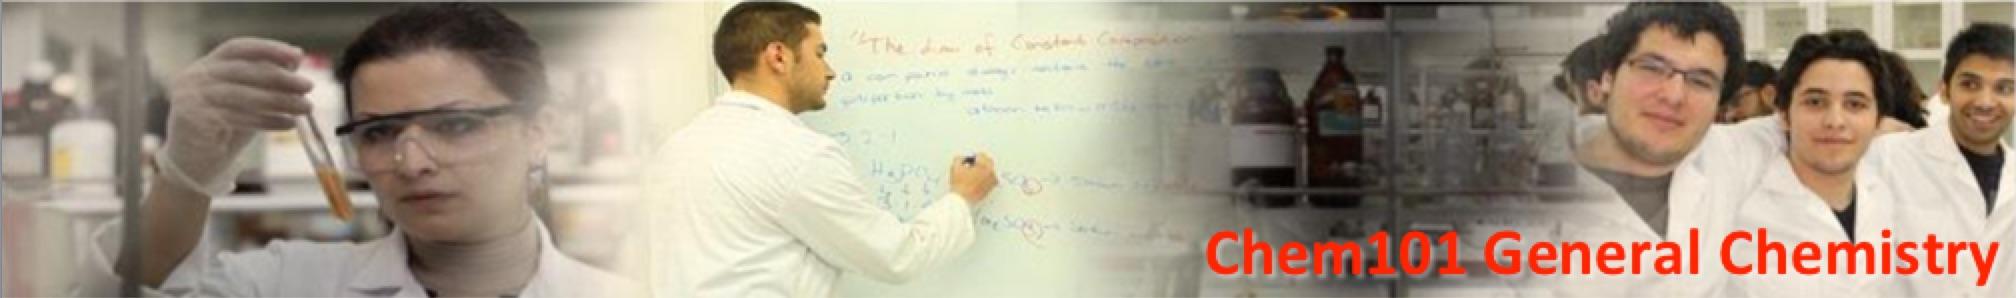 Summary of CHEM101 General Chemistry